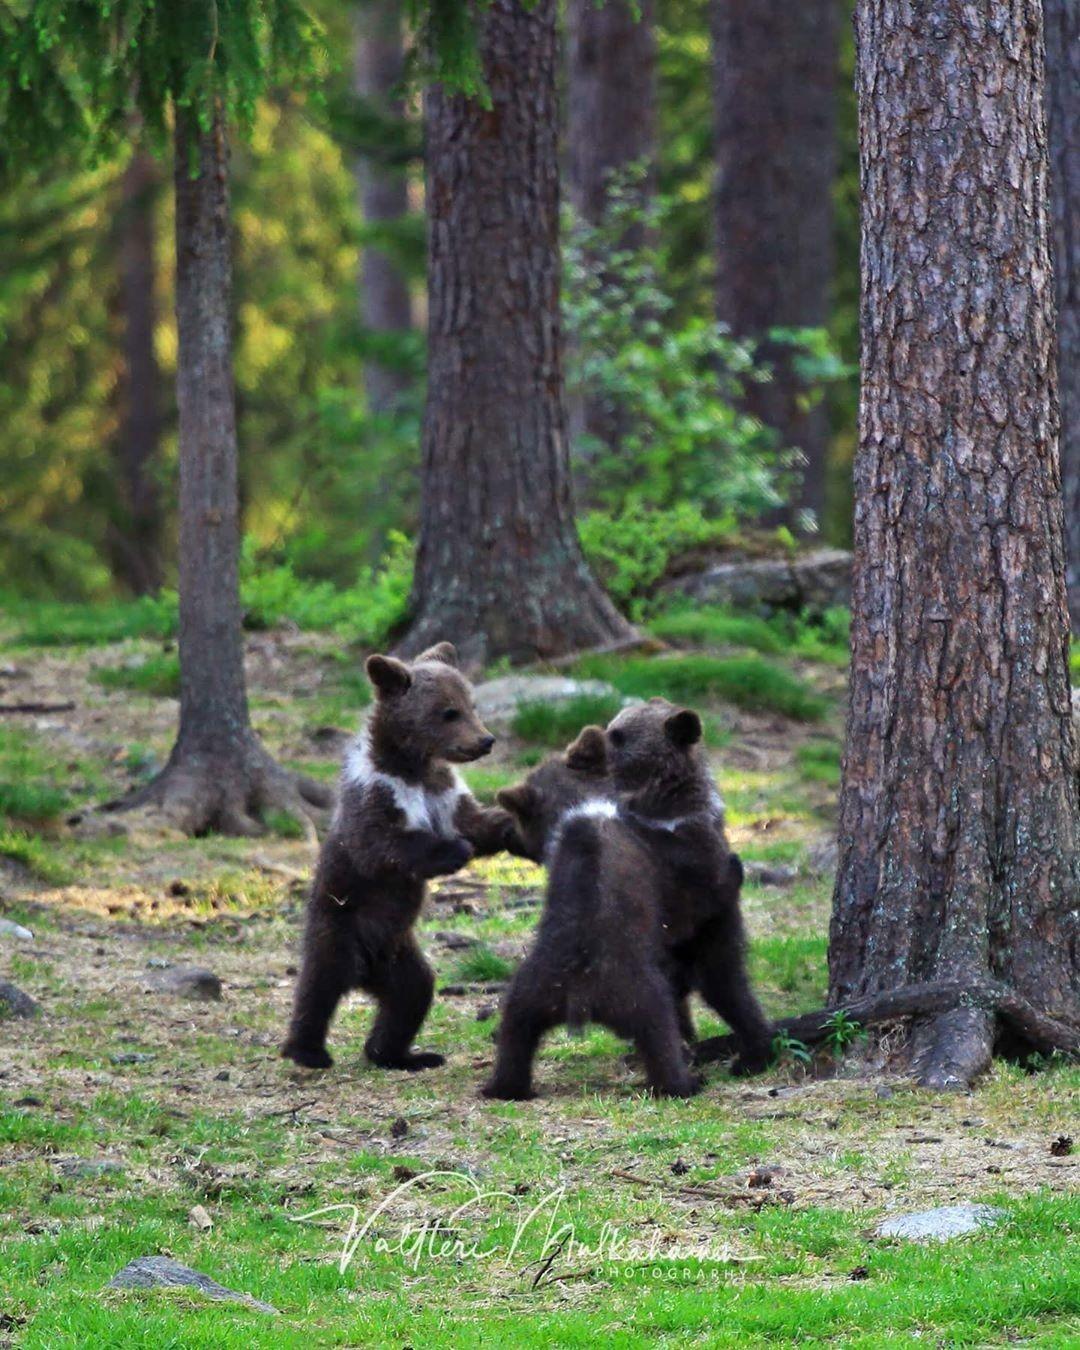 «Братья медвежата». Автор Валттери Мулкахайнен